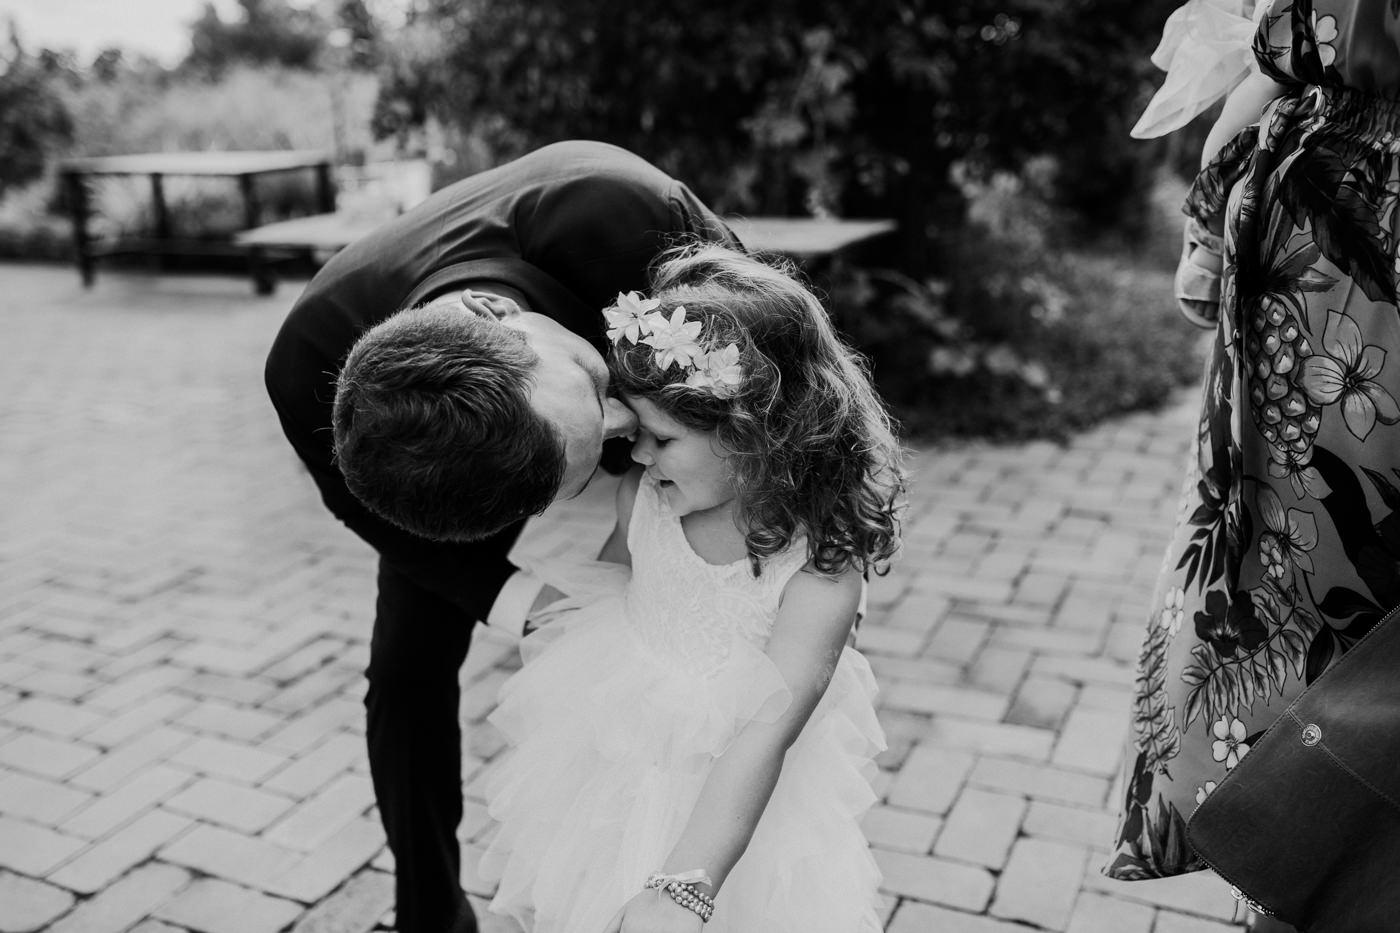 Anthony & Eliet - Wagga Wagga Wedding - Country NSW - Samantha Heather Photography-92.jpg